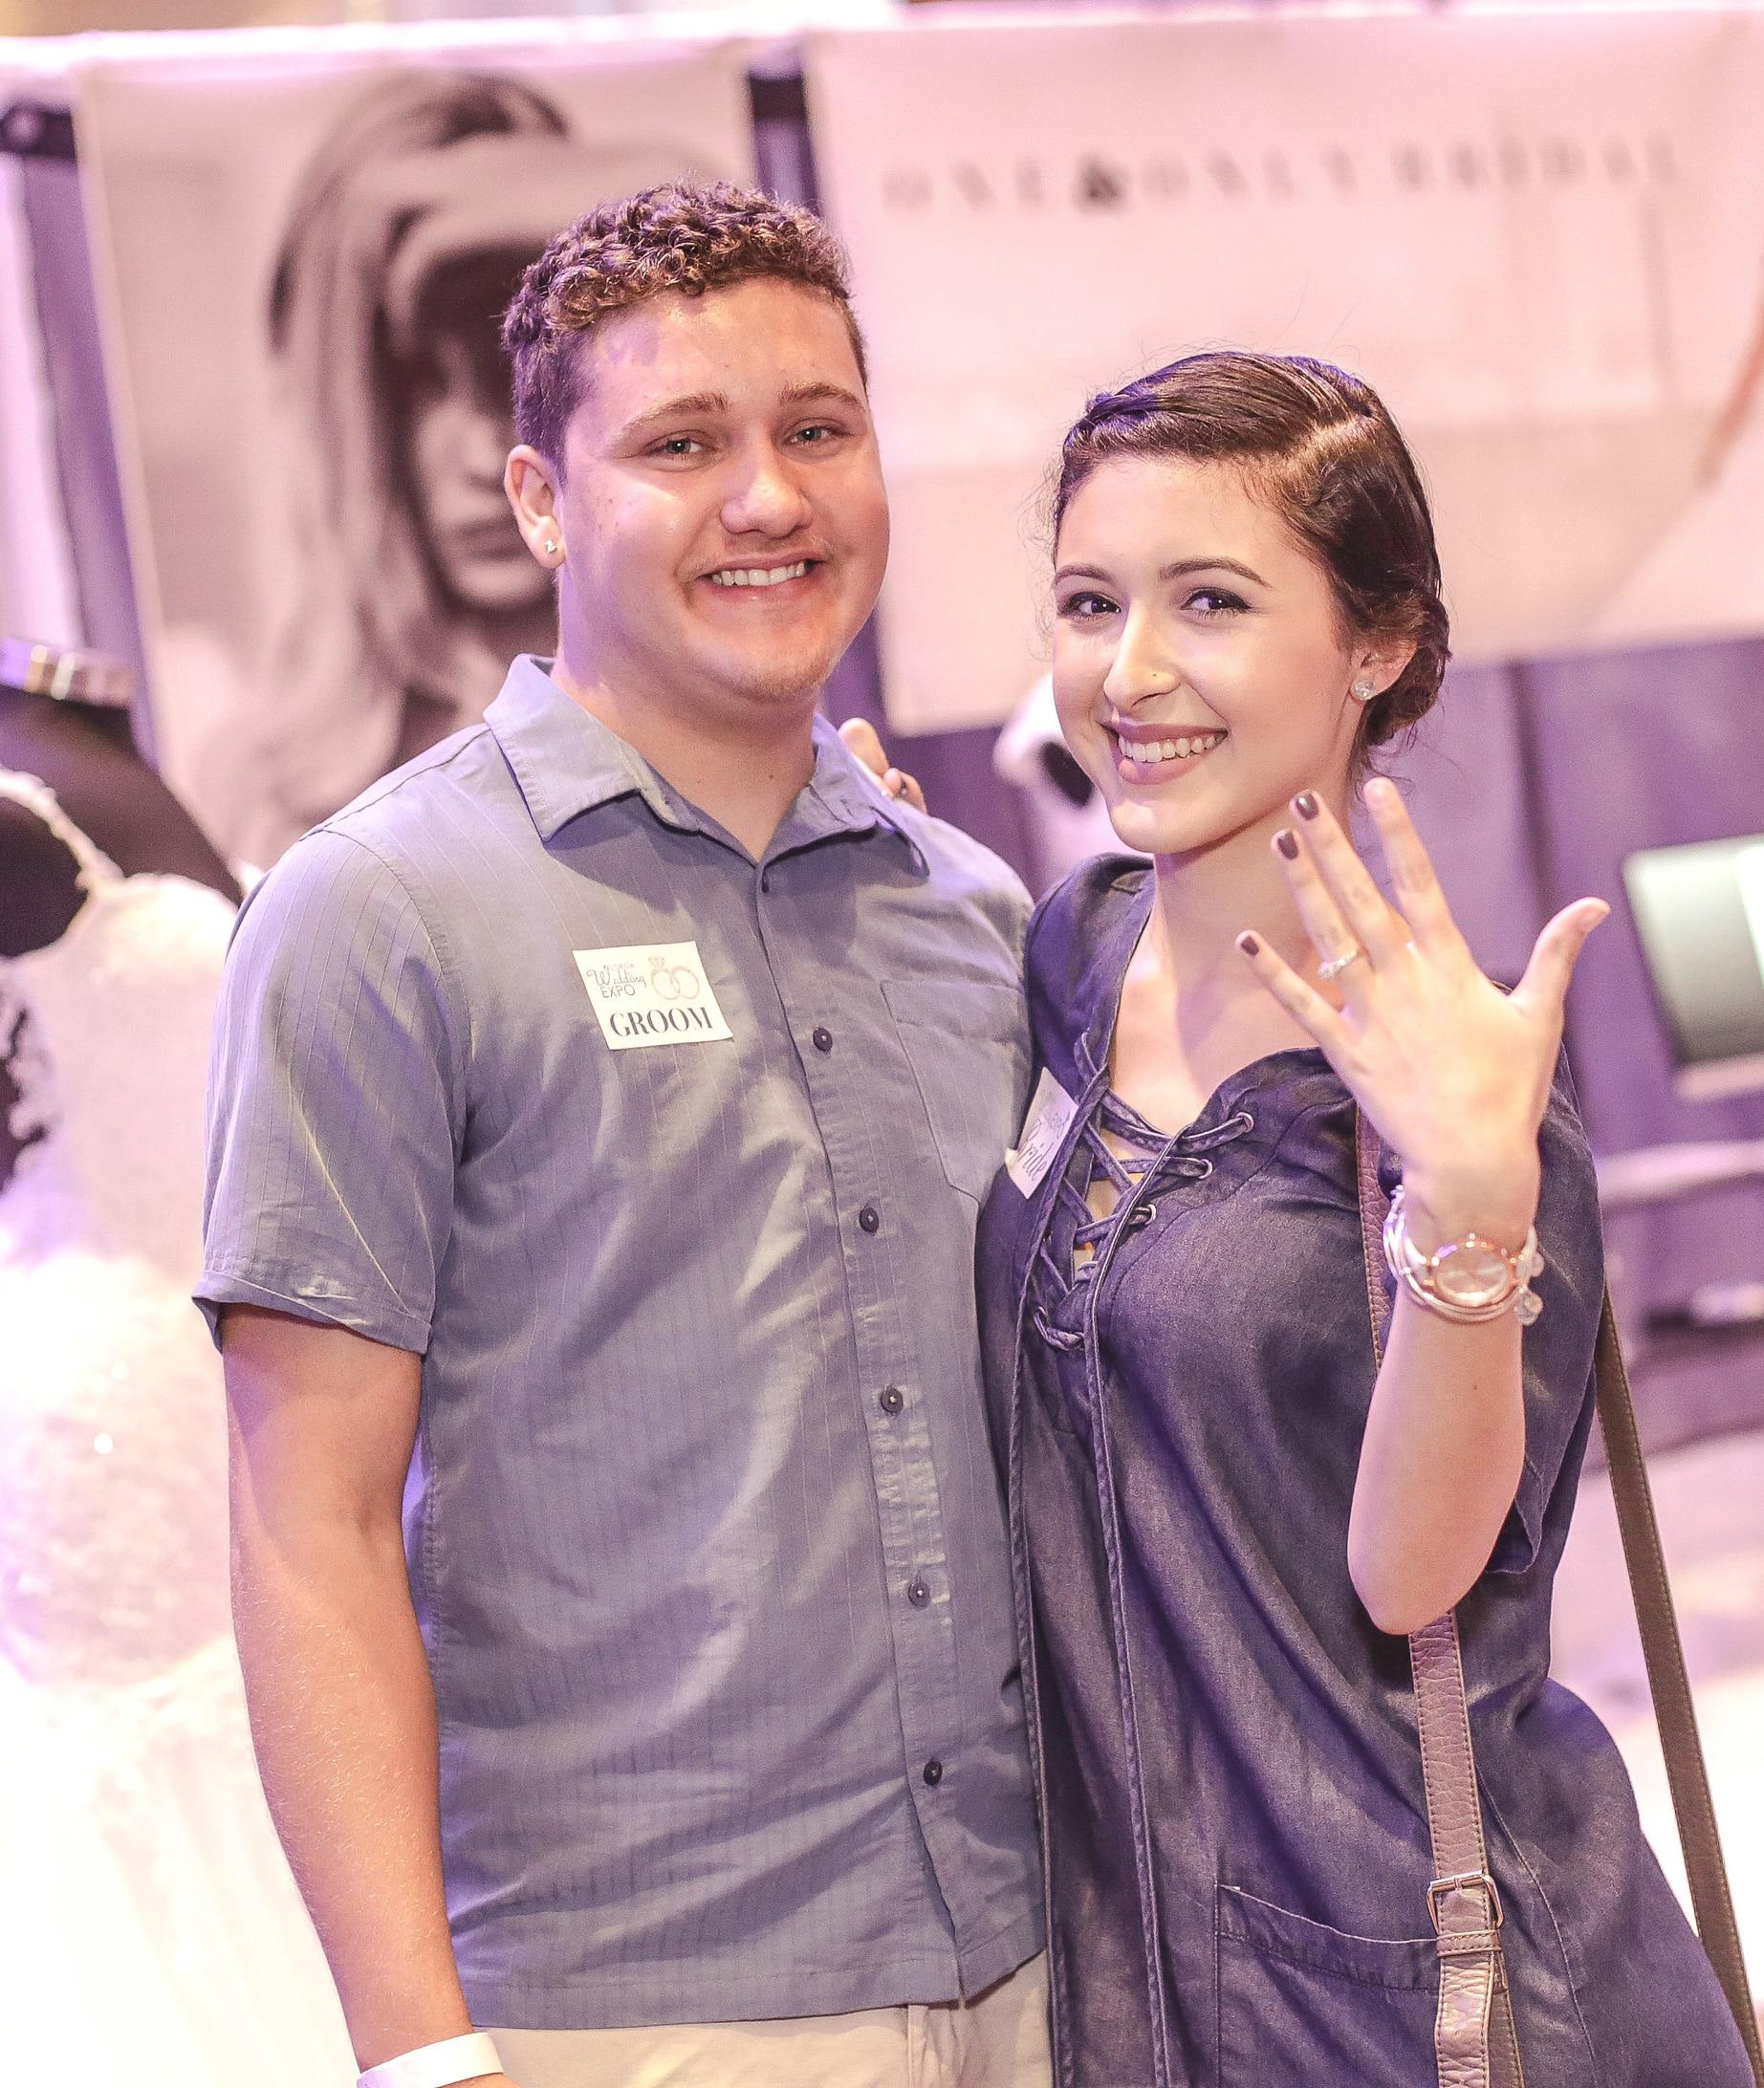 Wedding-Show-1-1845x2184